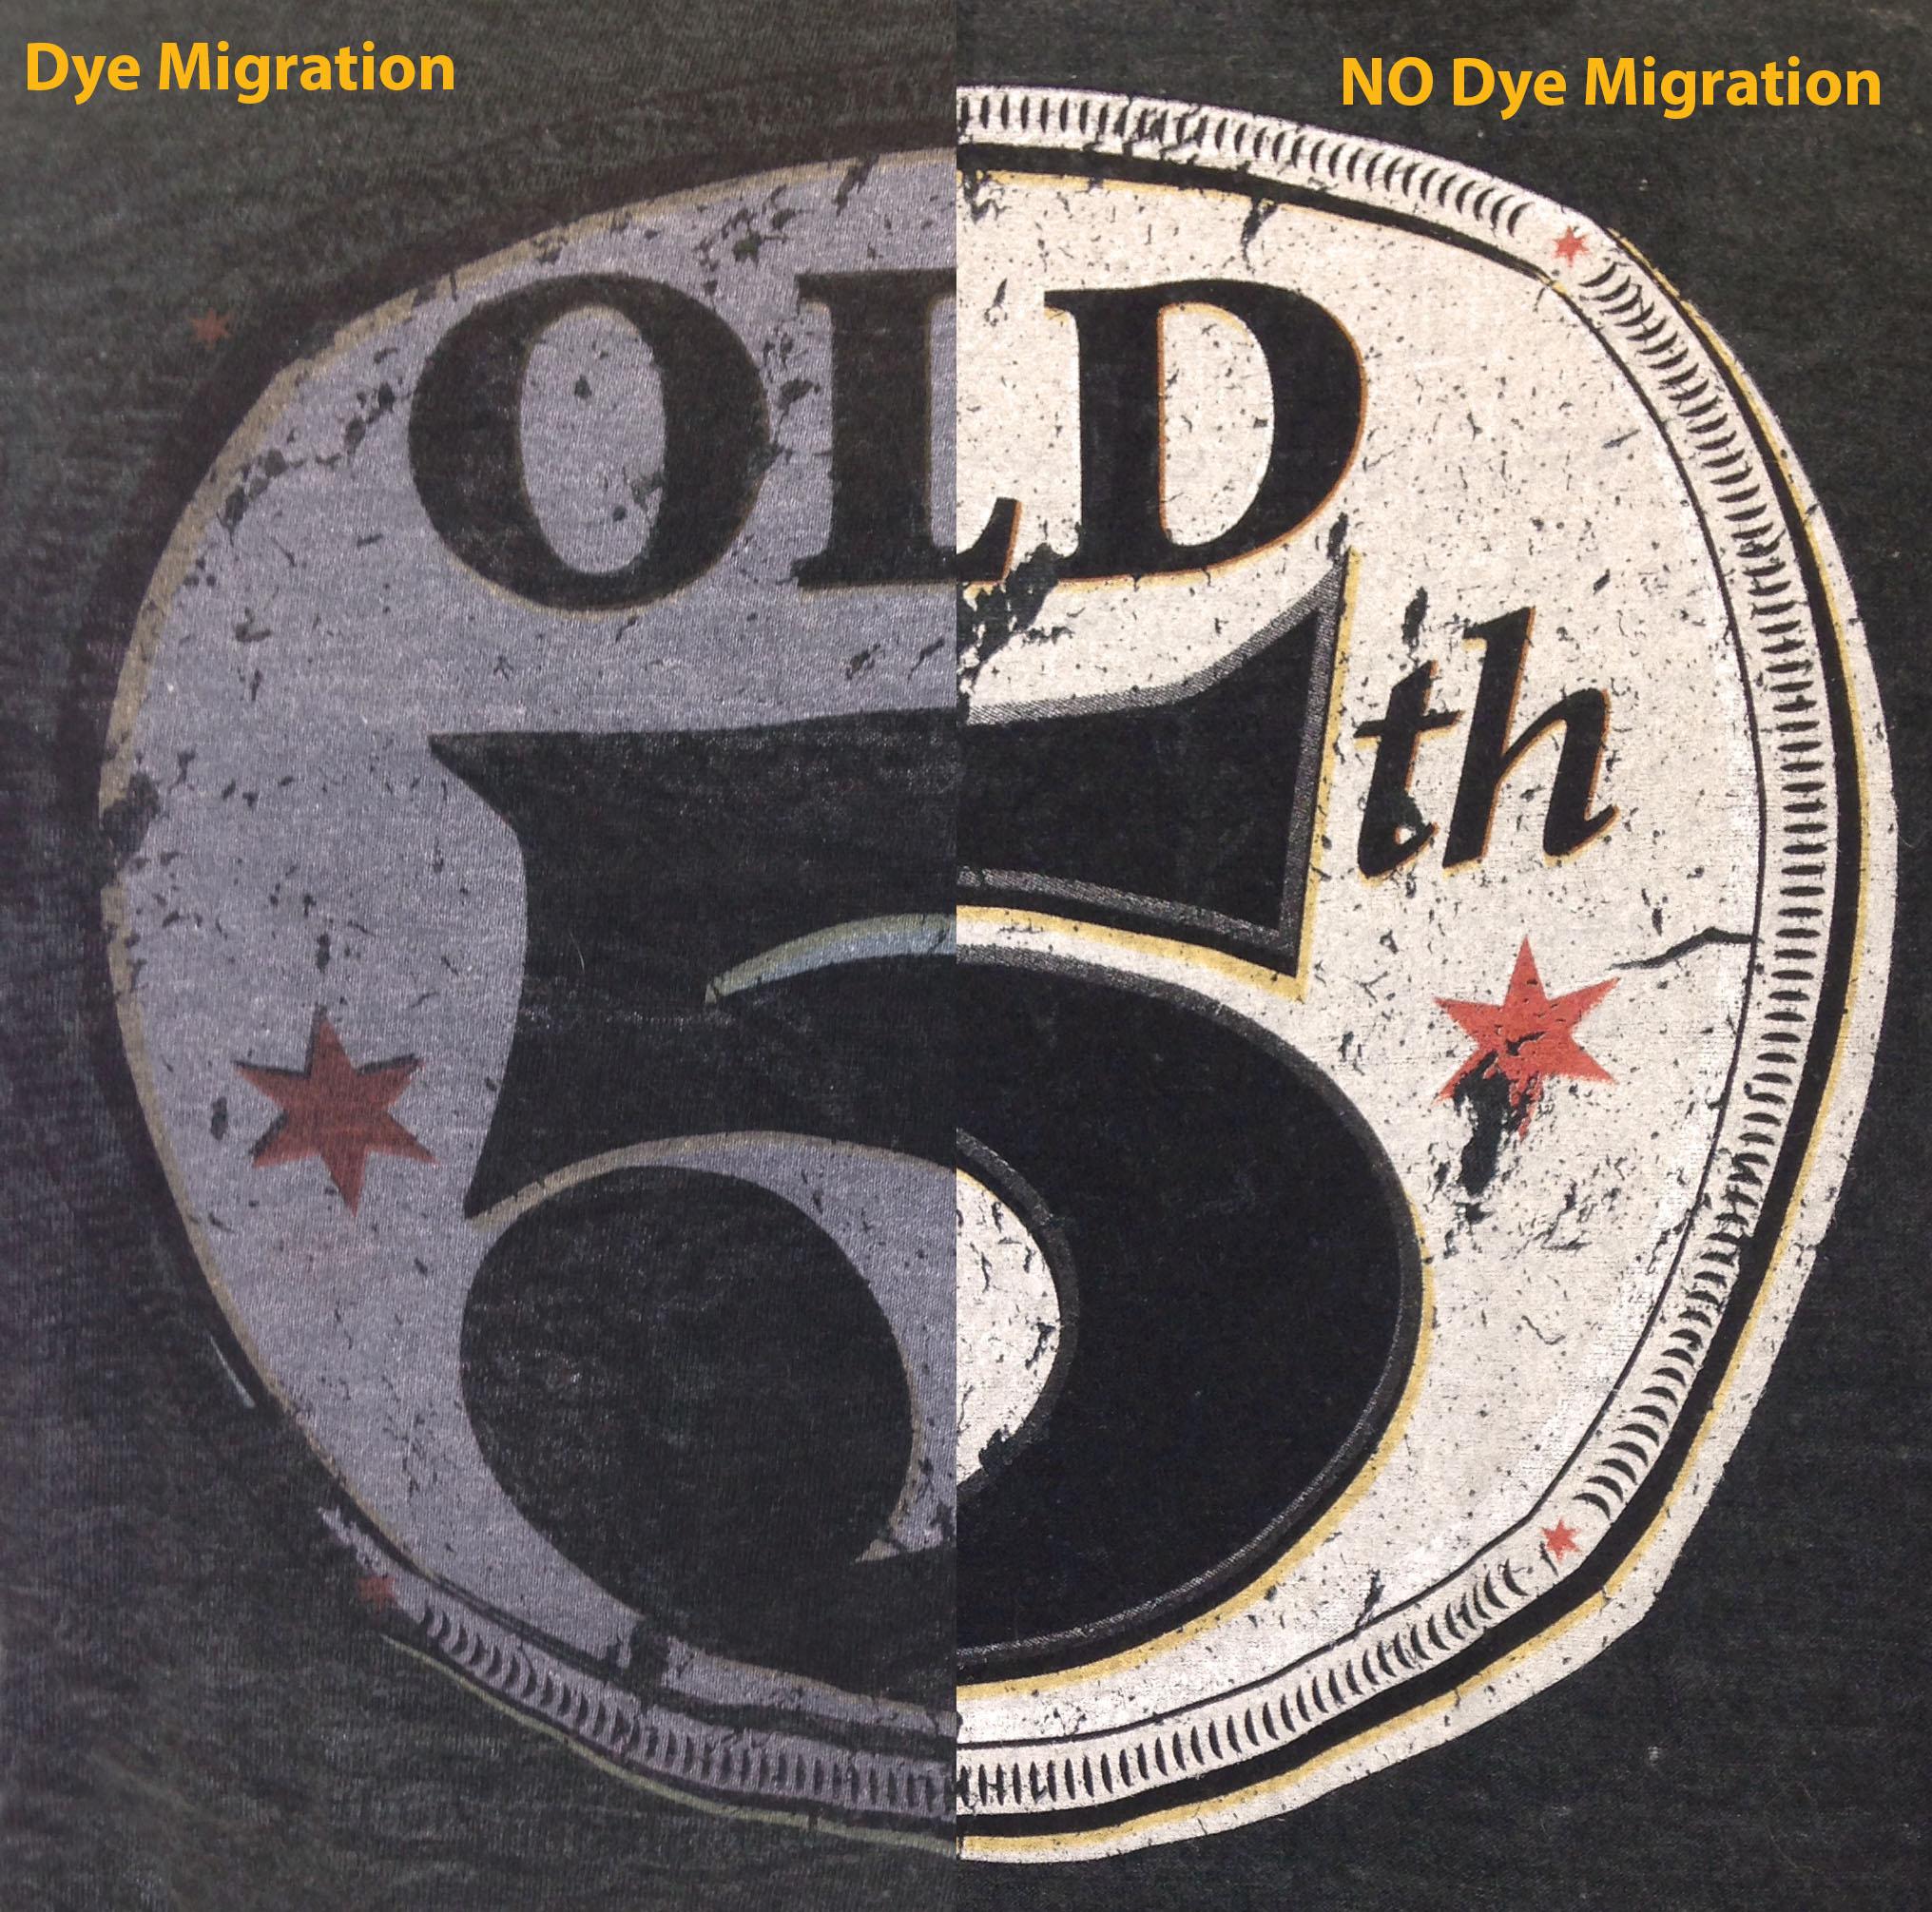 dye_migration_on_tshirt_printing.jpg